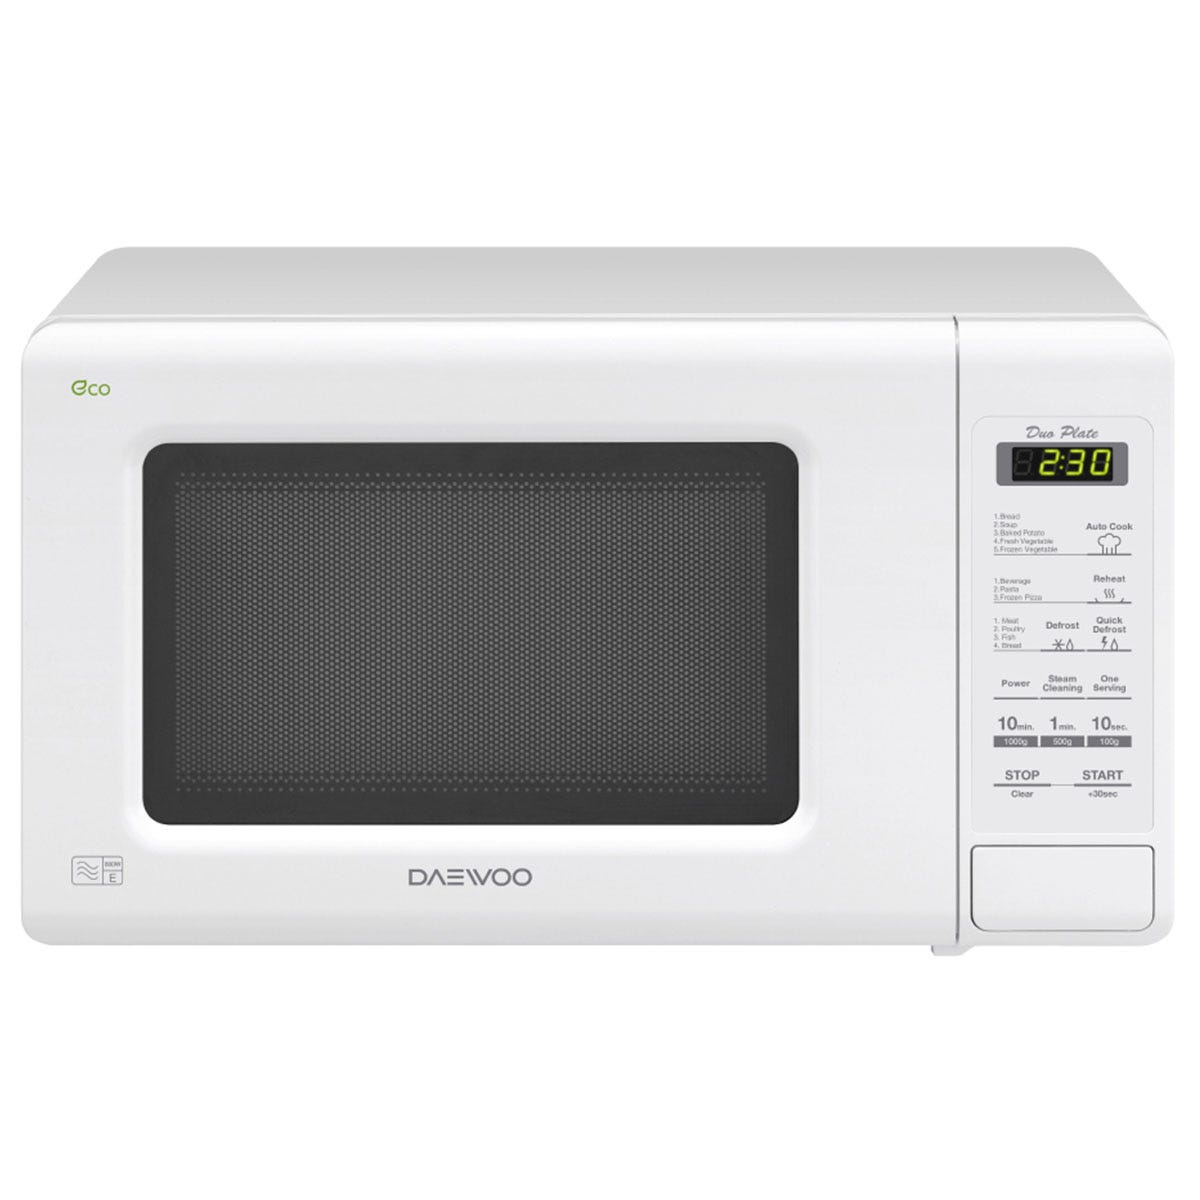 Daewoo KOR6M1RDWR 20L Touch Control 800W Digital Microwave - White